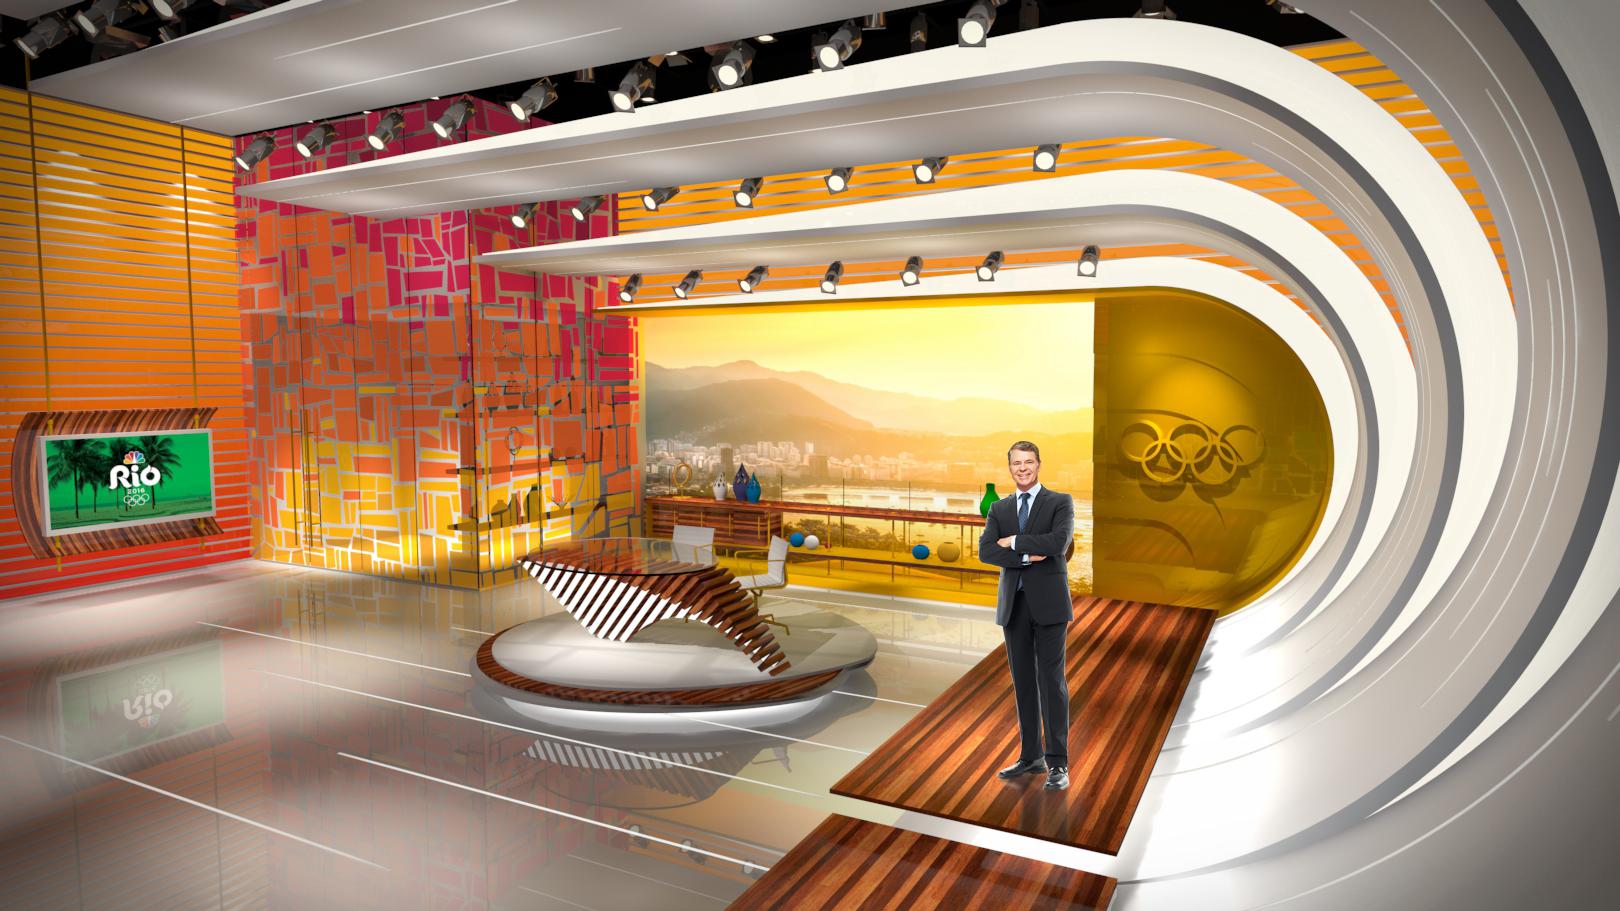 Nbc Rio Olympics Set Design Gallery